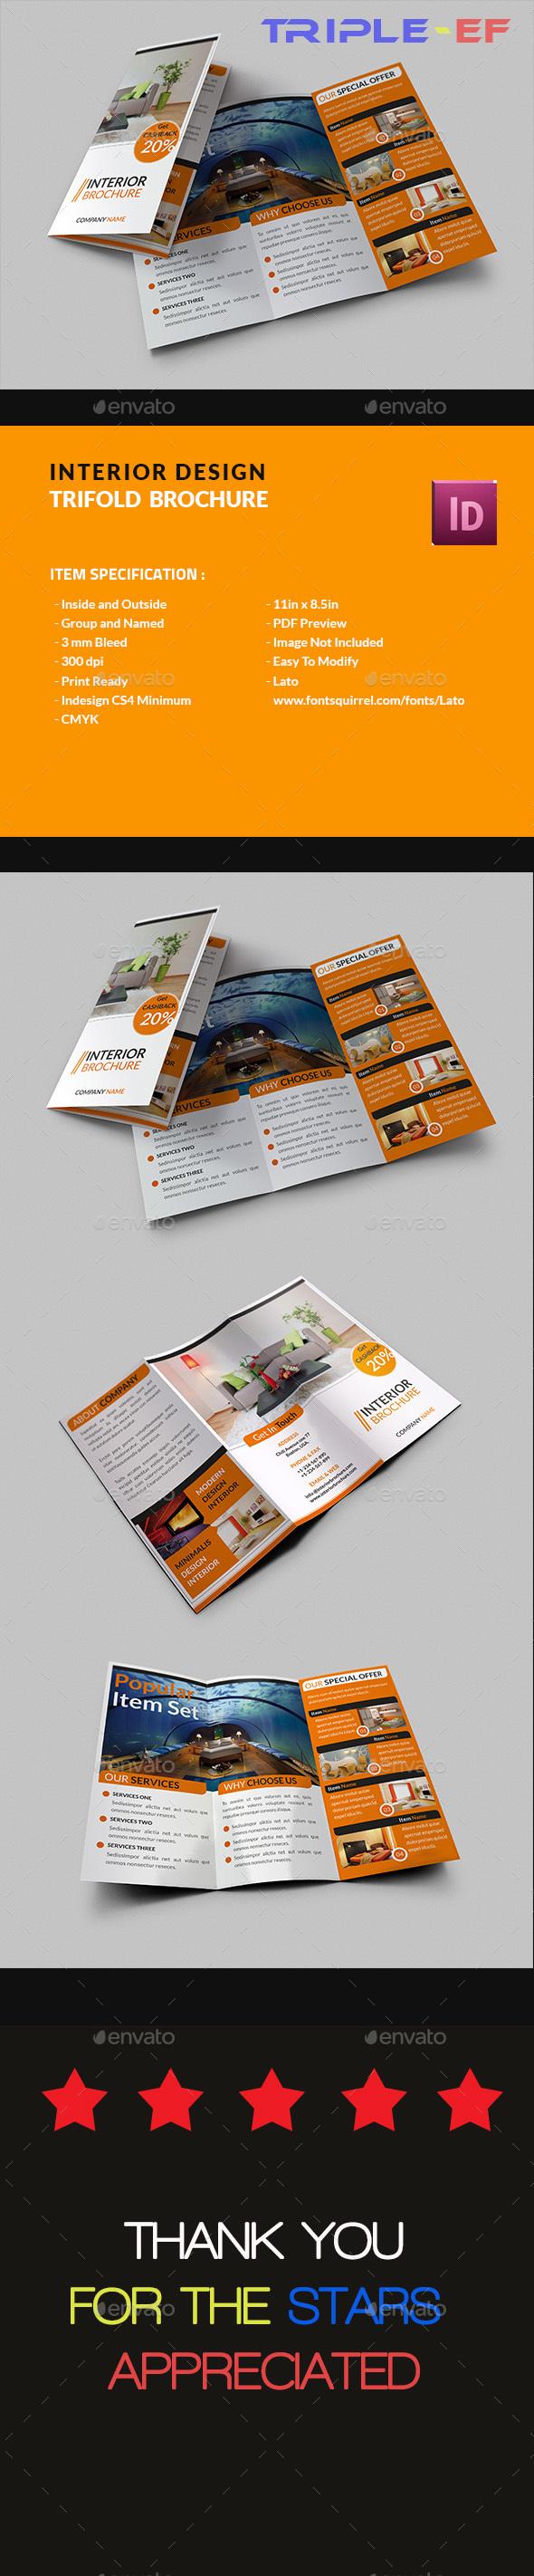 Interior Design Trifold Brochure - Brochures Print Templates